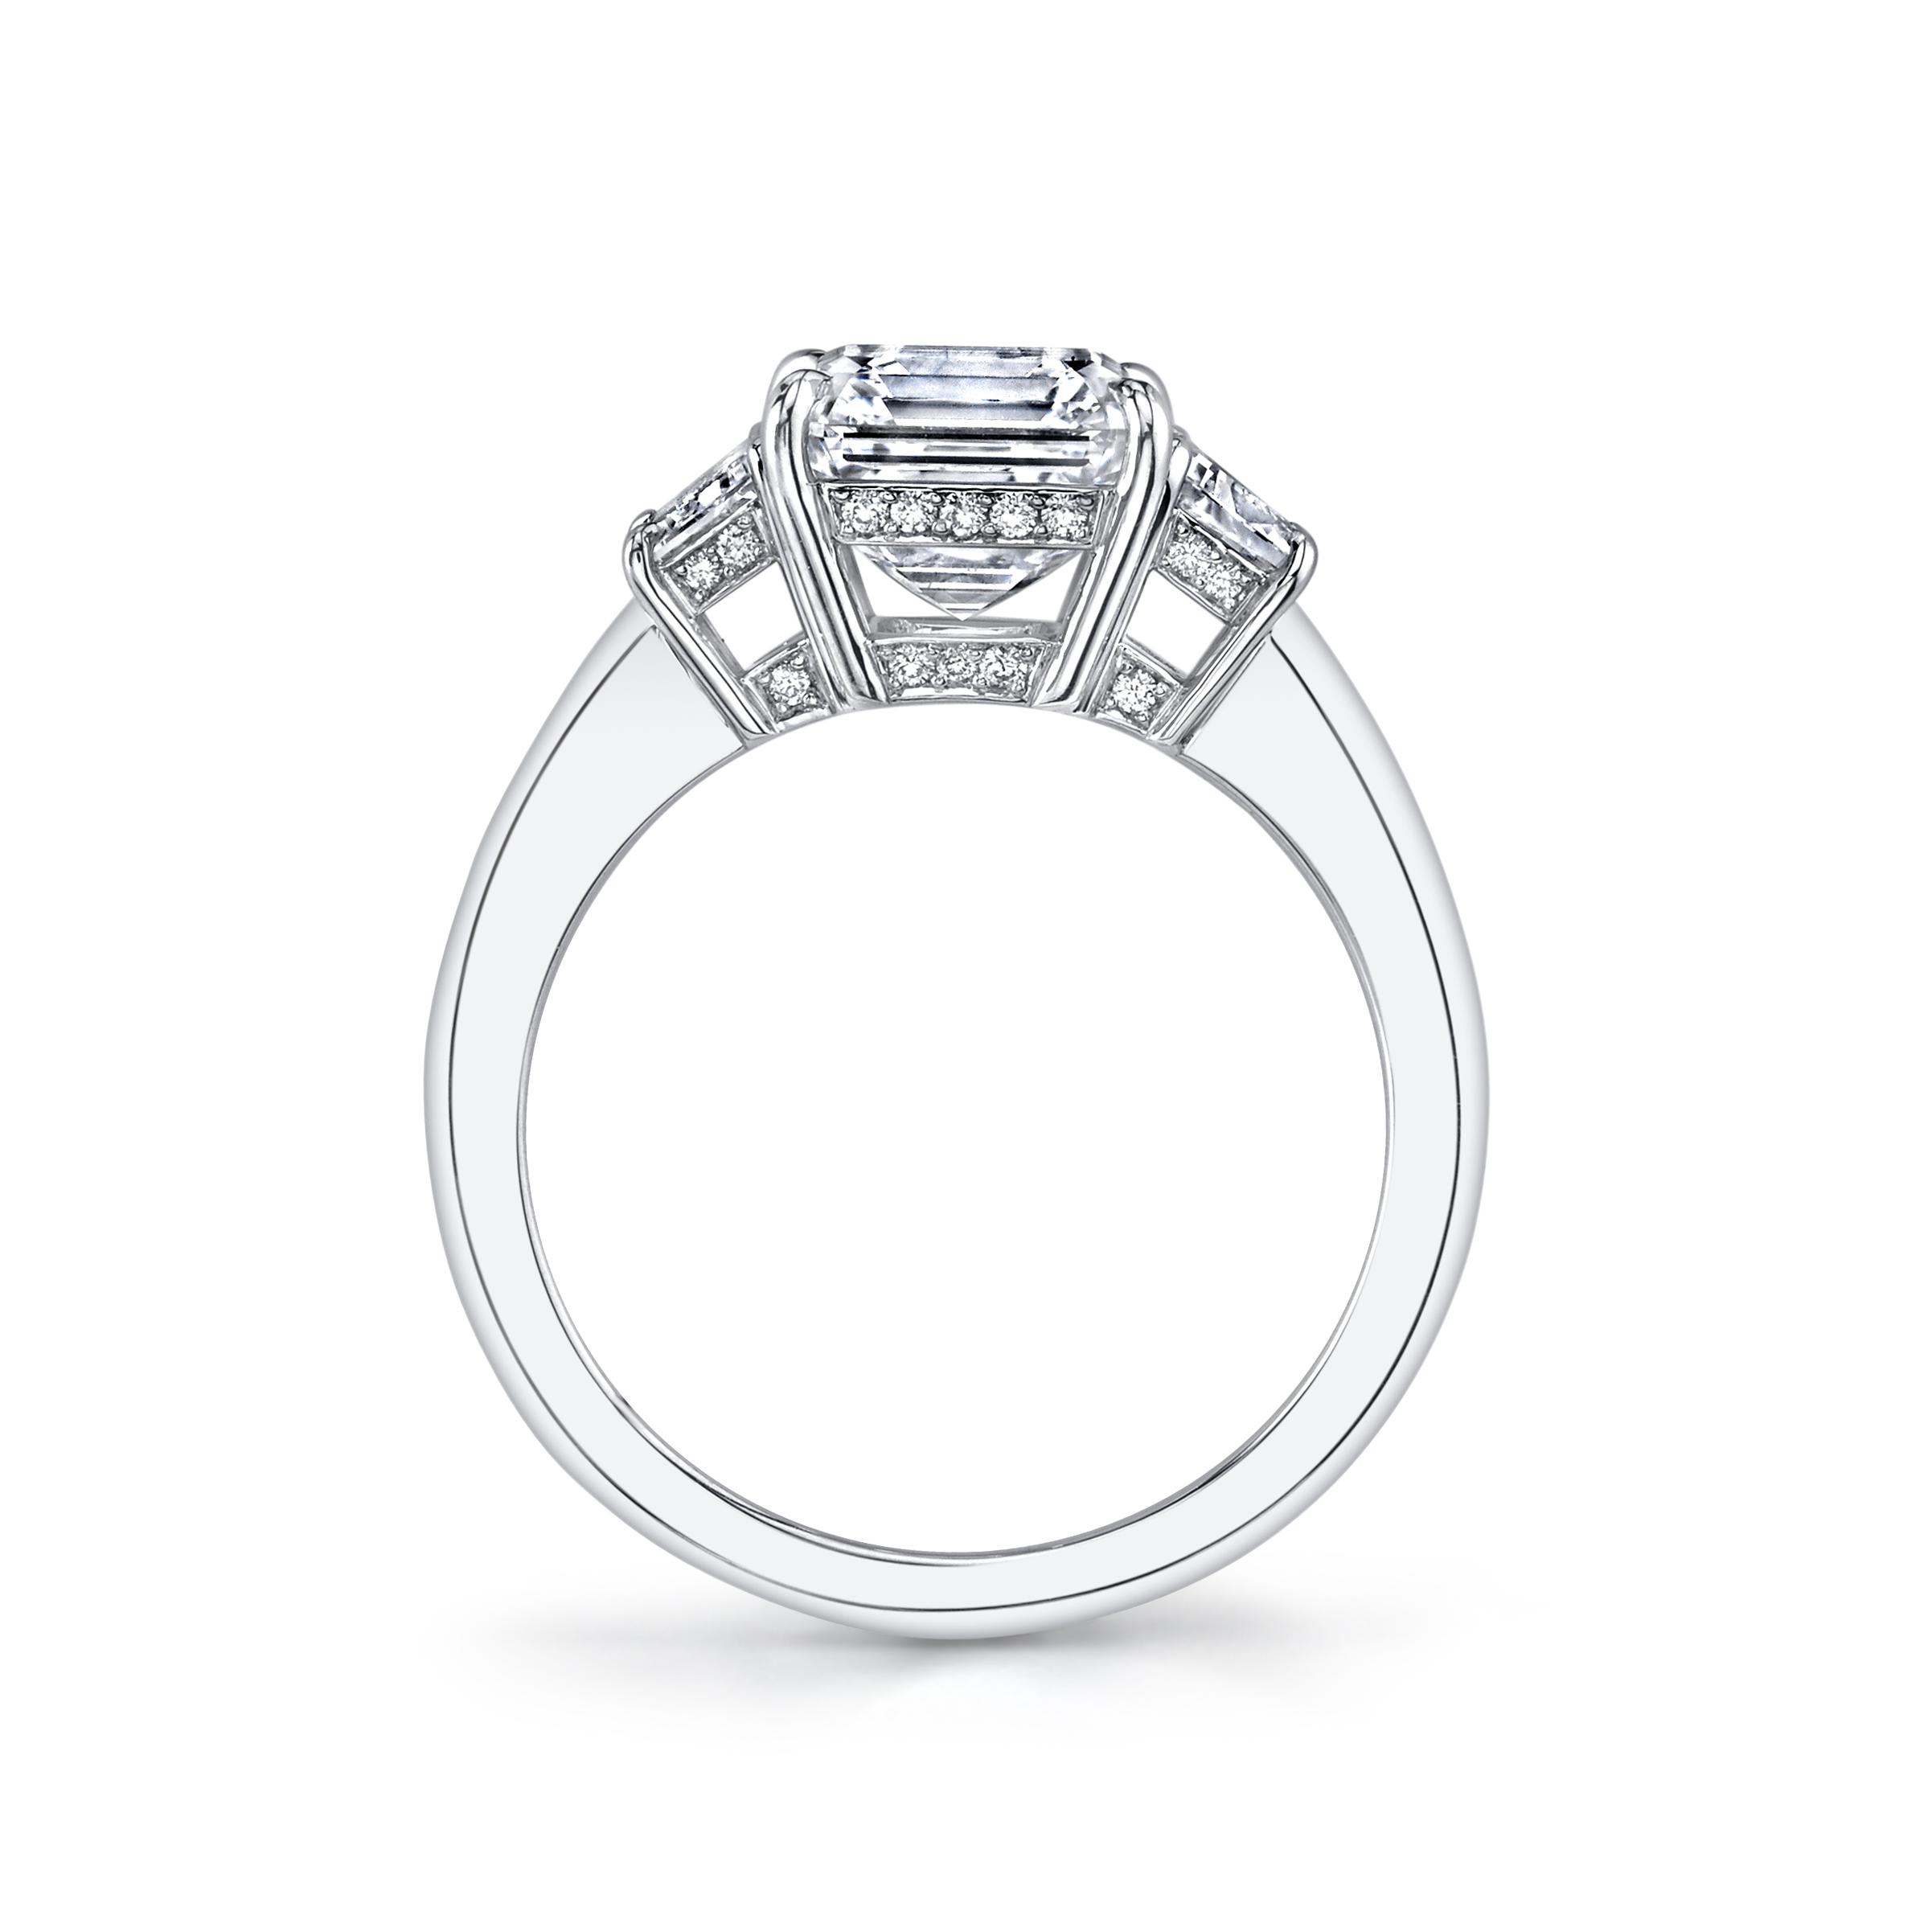 Asscher Cut Amp T Zoid Diamond Three Stone Ring